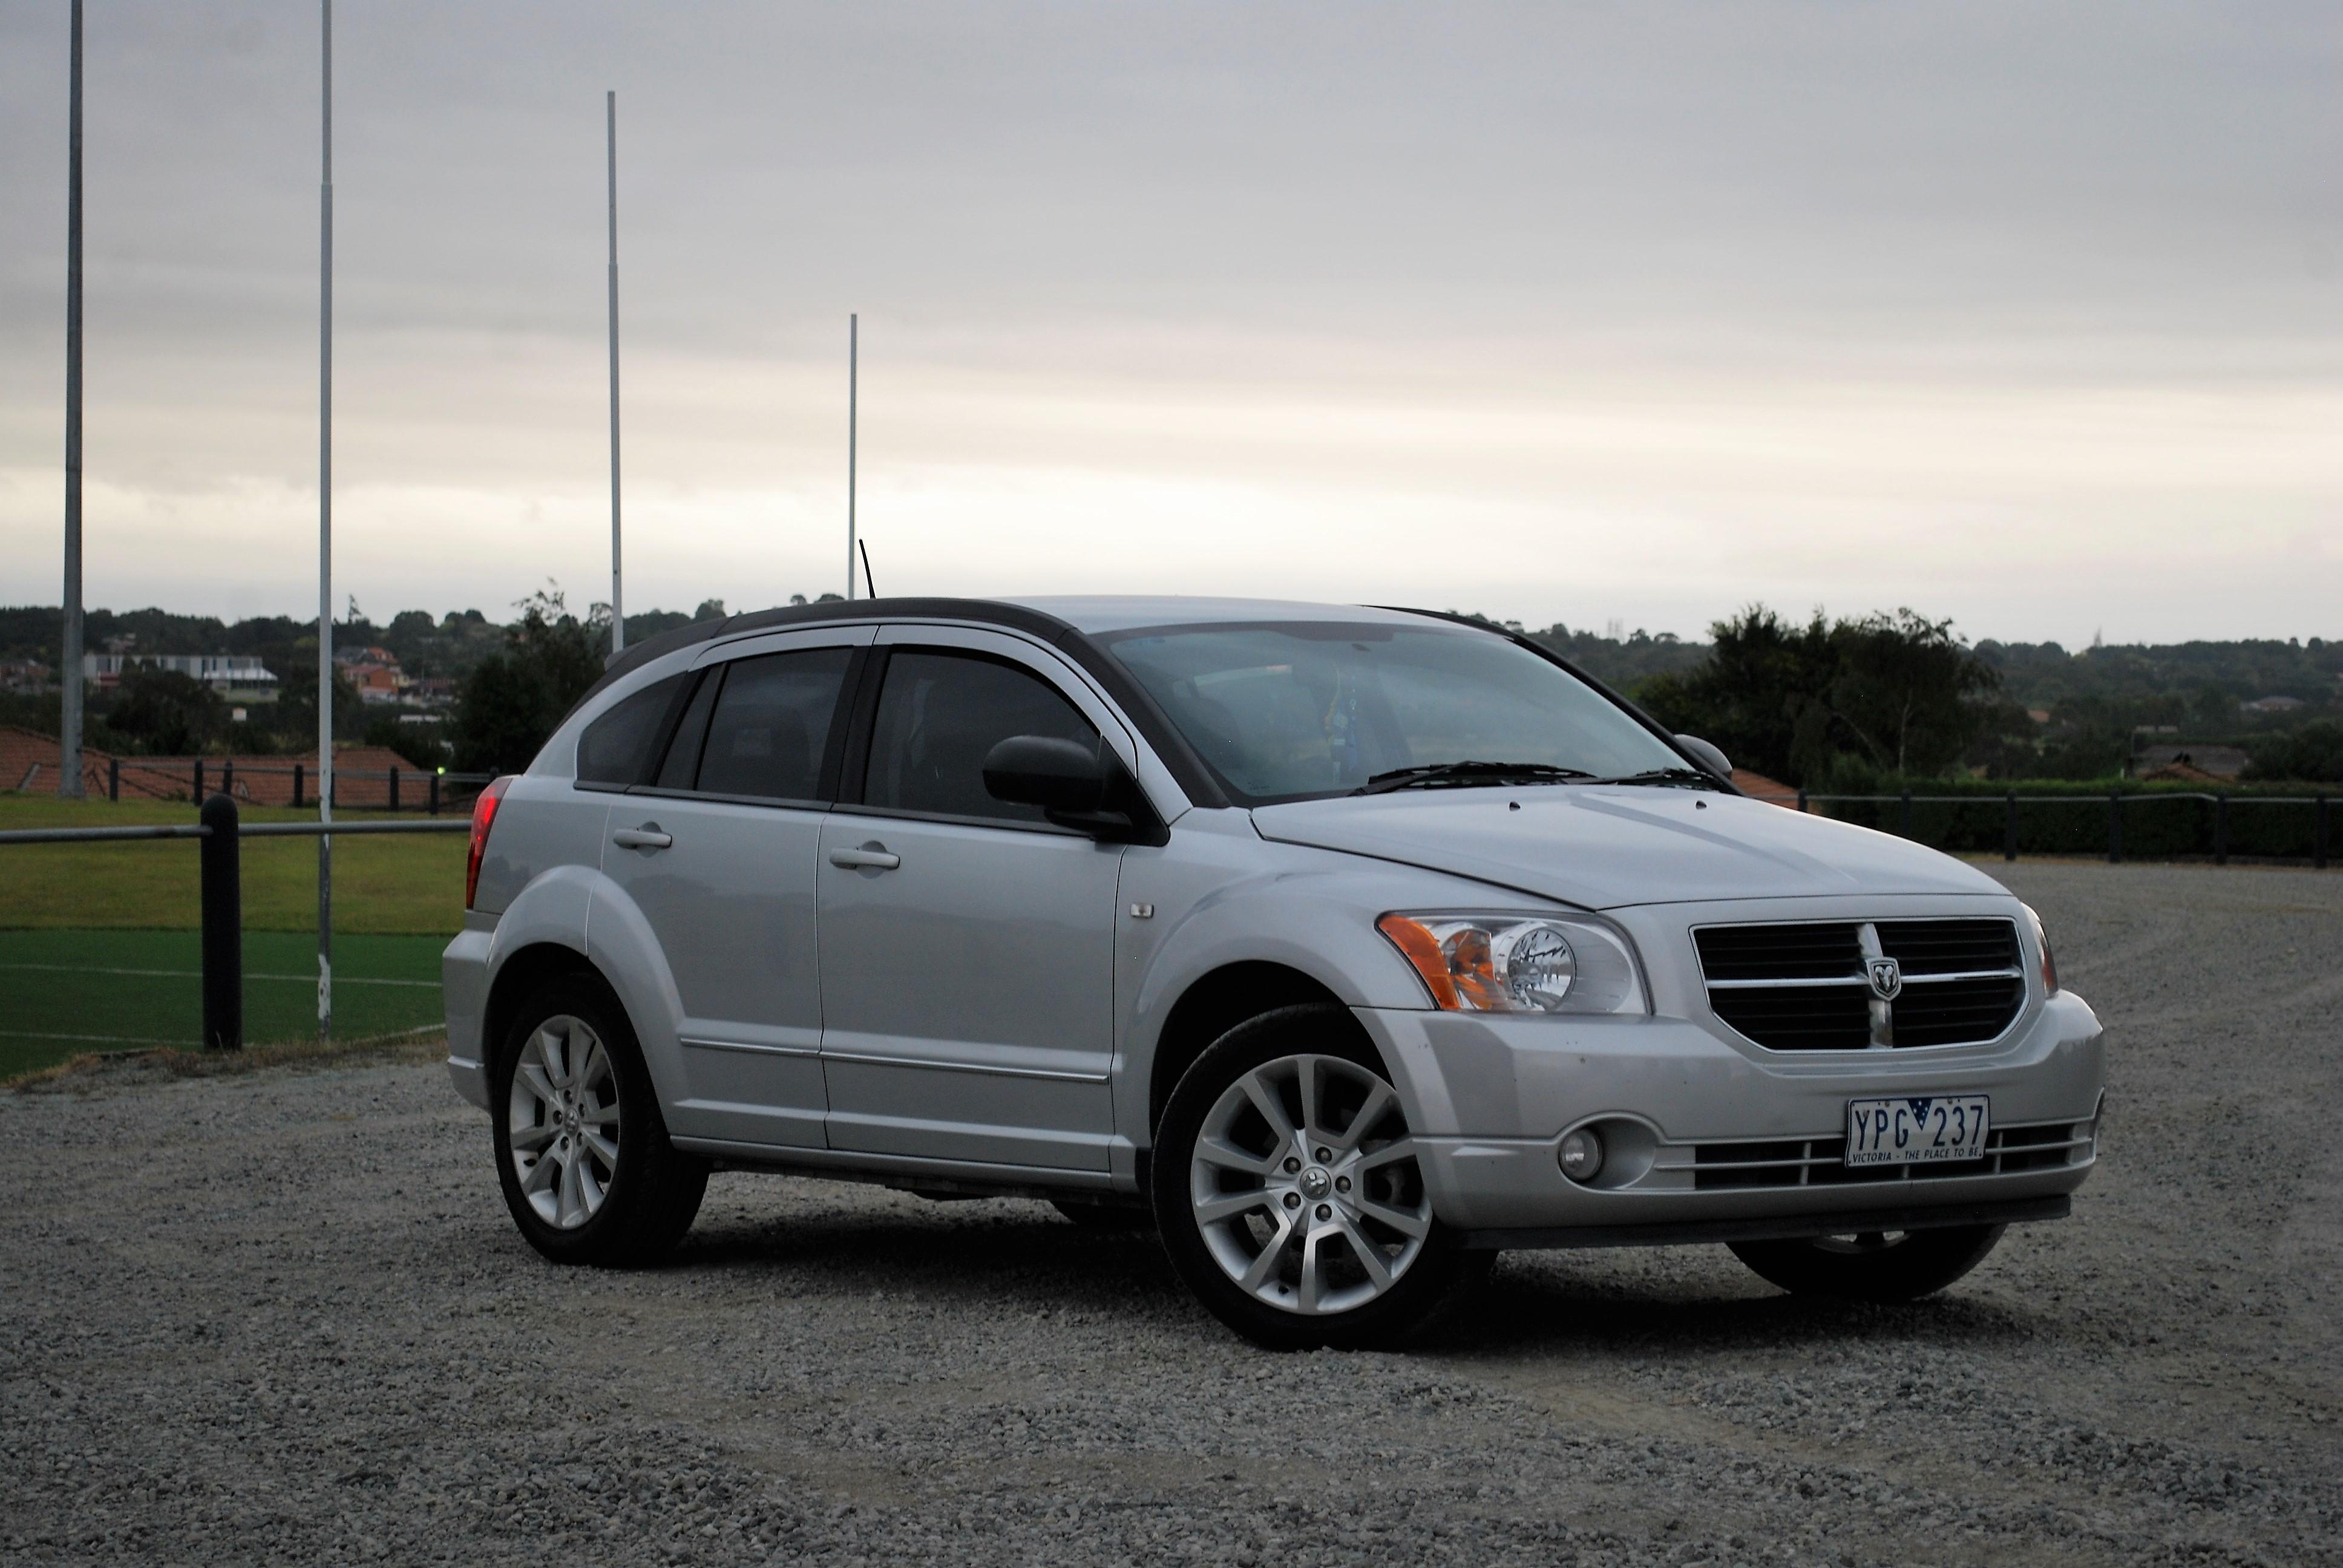 Passenger Cars For Sale >> 2011 Dodge Caliber SXT – Find Me Cars